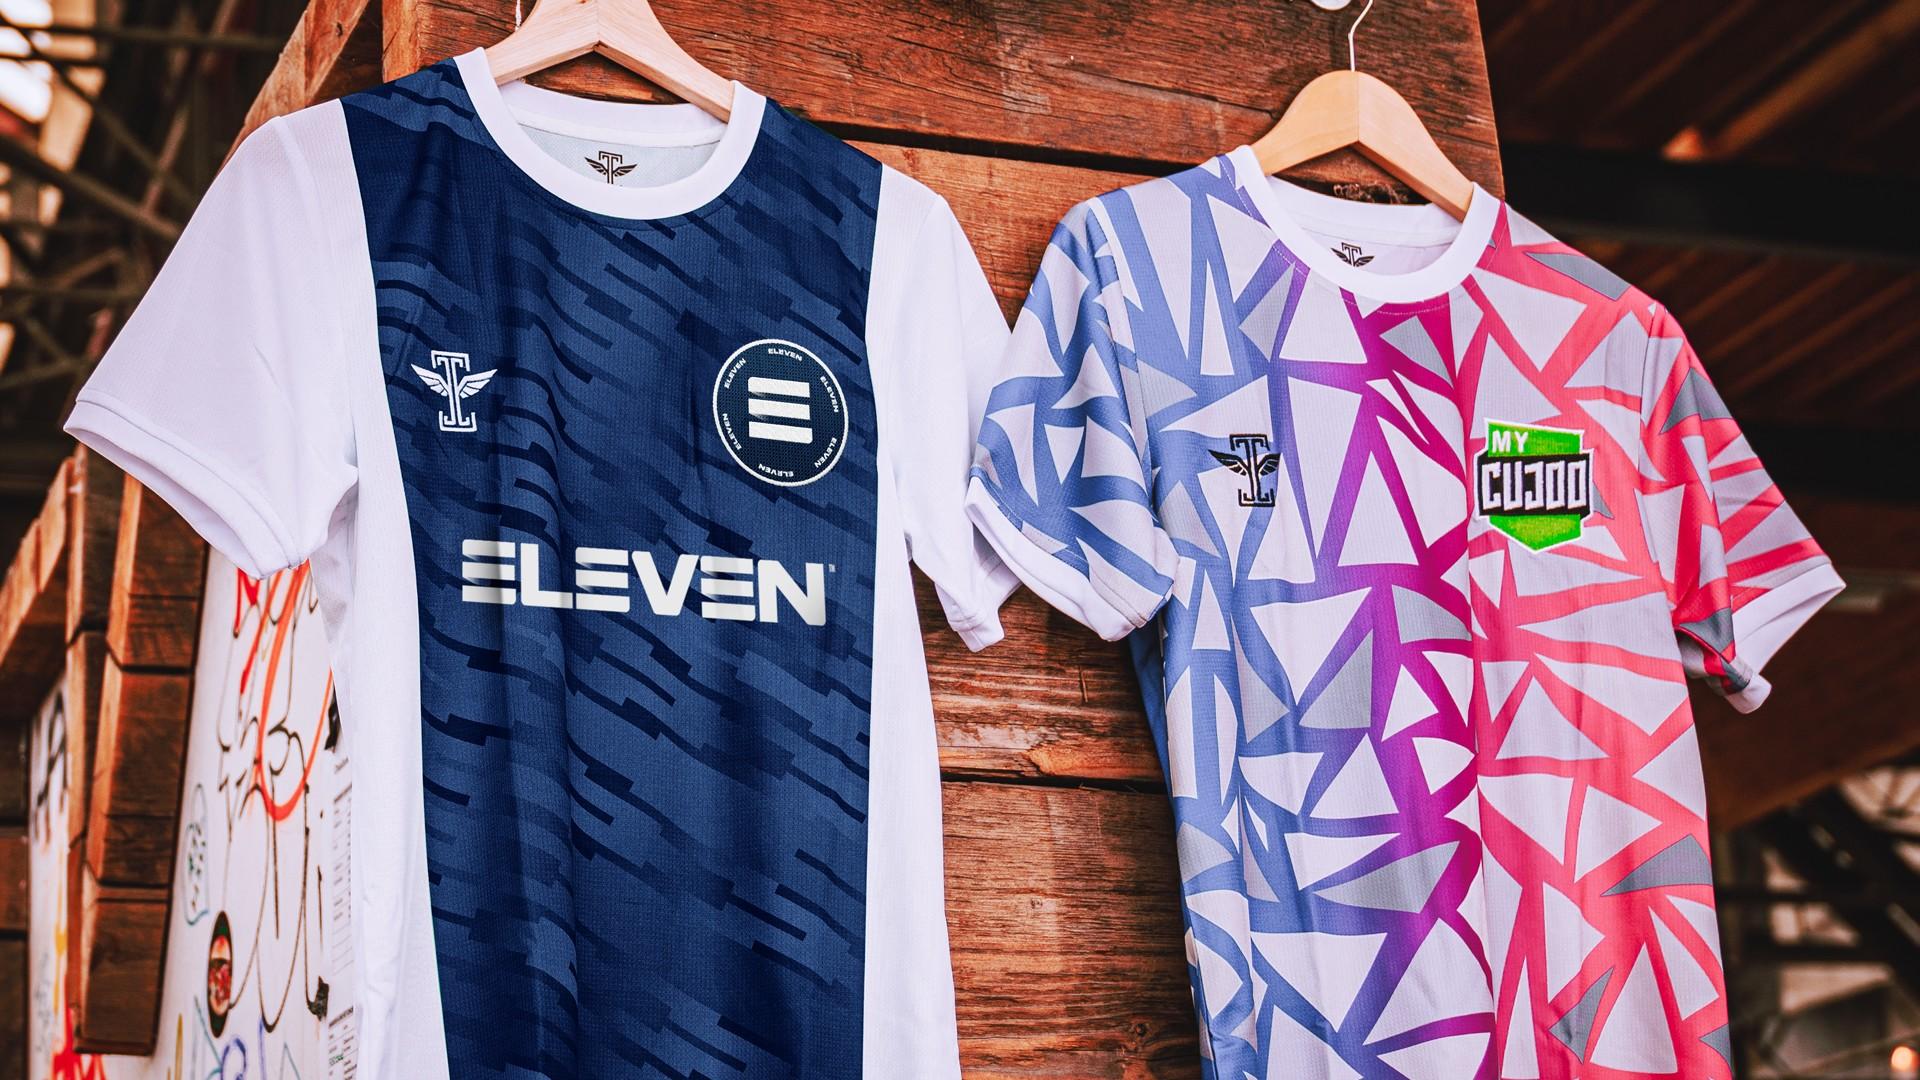 Eleven Sports x MyCujoo